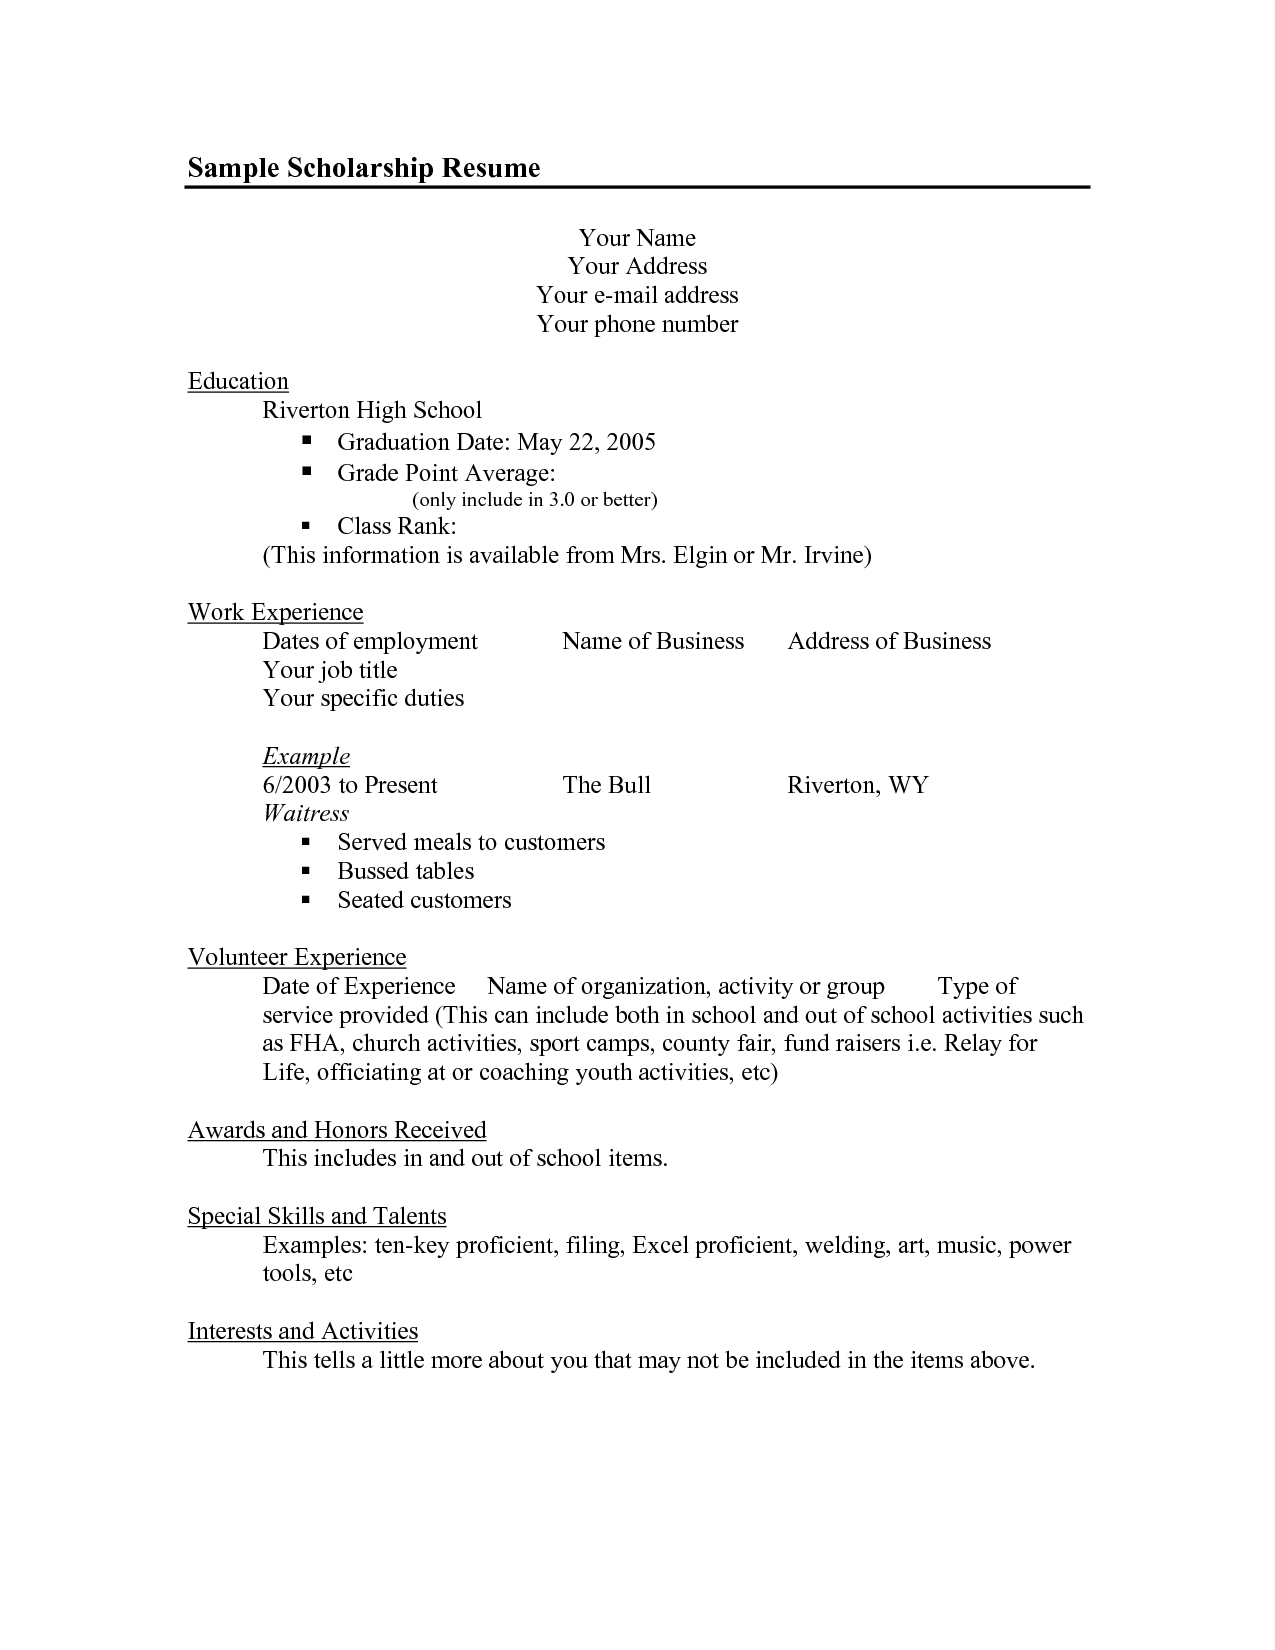 resume Scholarship Resume scholarship resume objective examples of resumes template fsgcrcom mvxhldbr kims senior pics